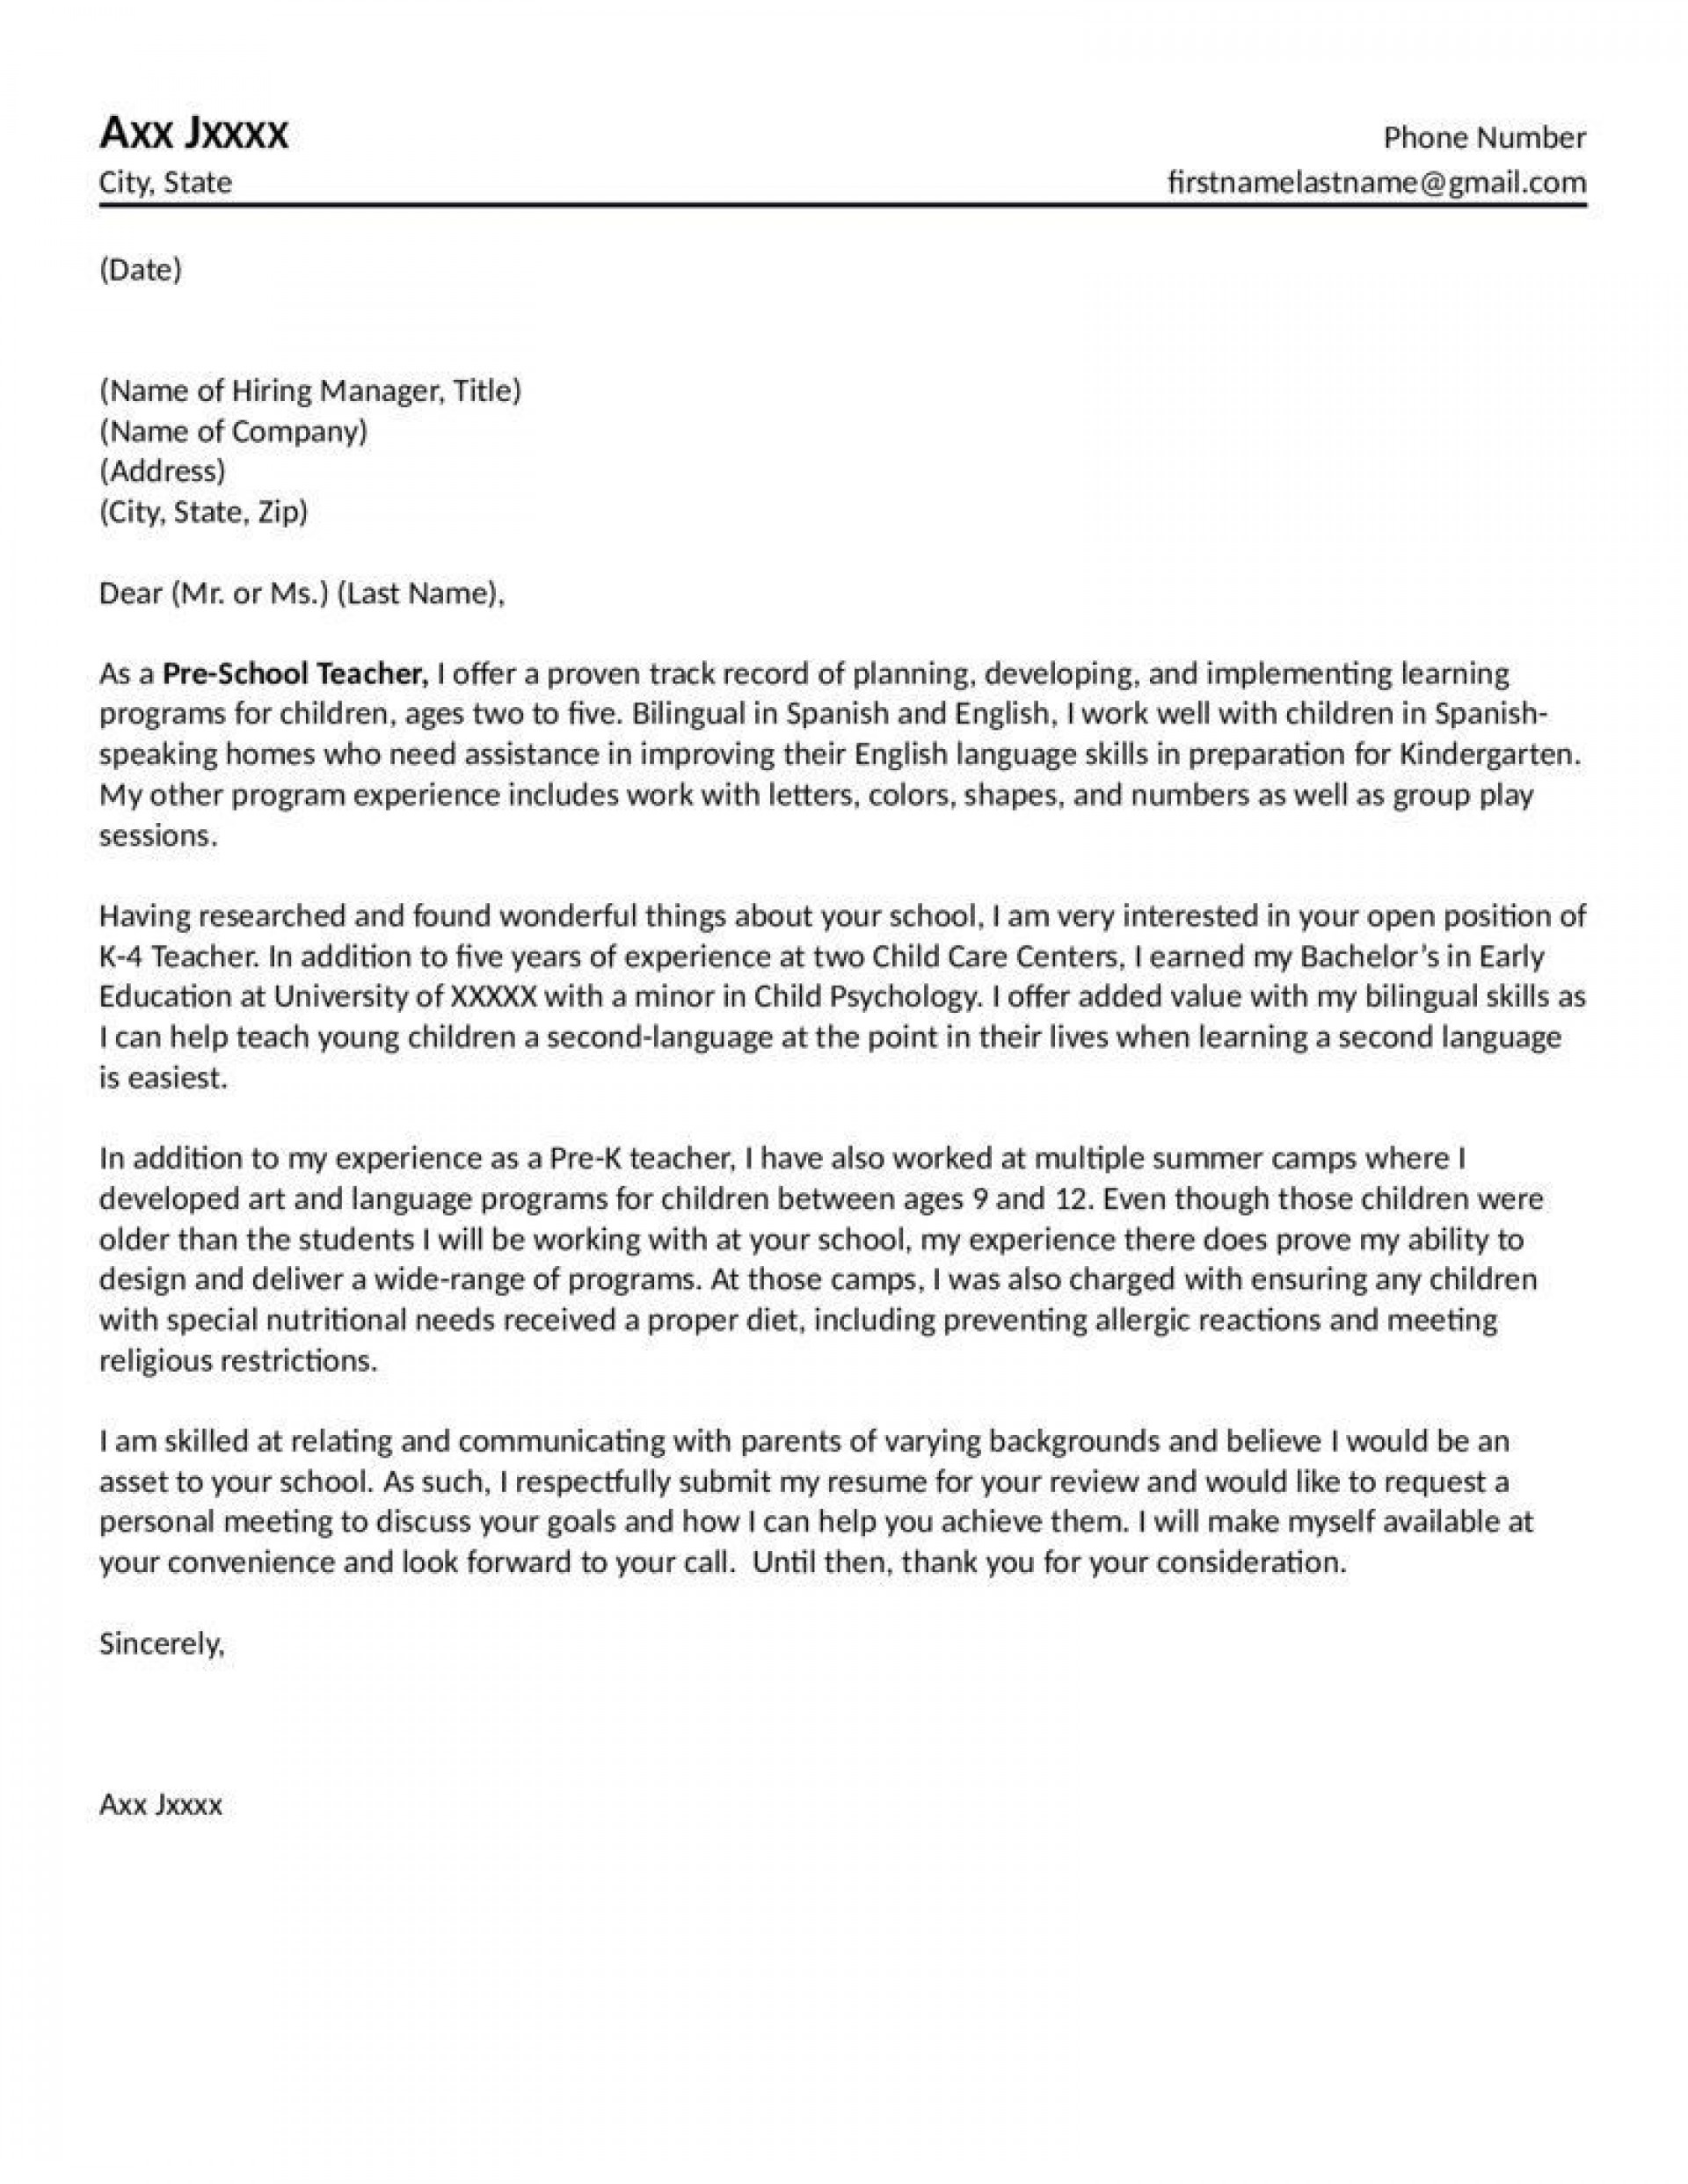 002 Wonderful Teacher Cover Letter Template Highest Clarity  Teaching Job1920